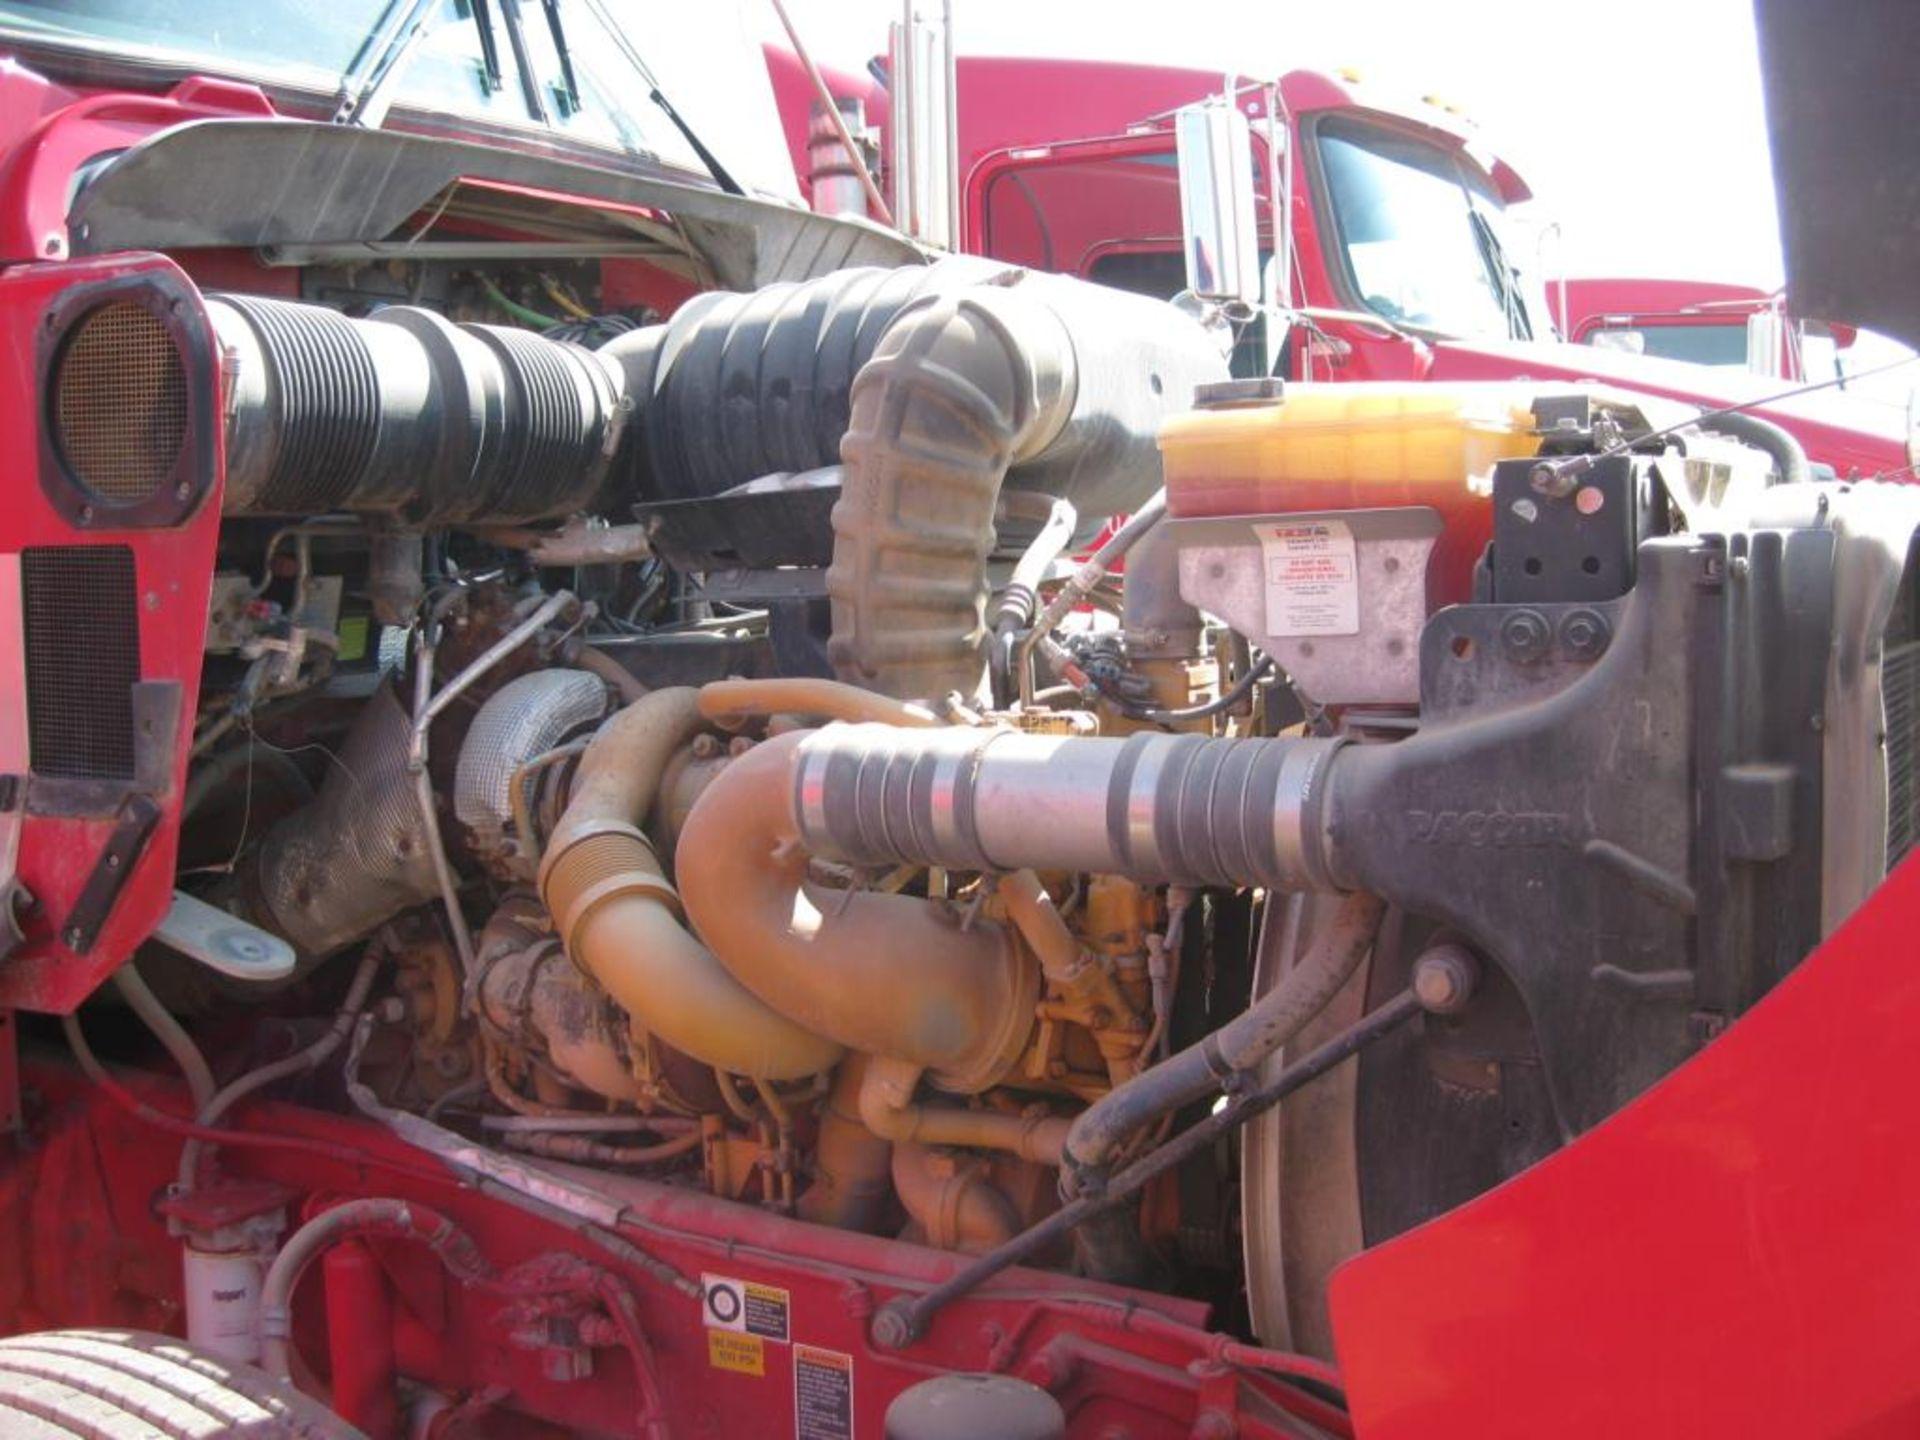 Kenworth Truck - Image 22 of 22